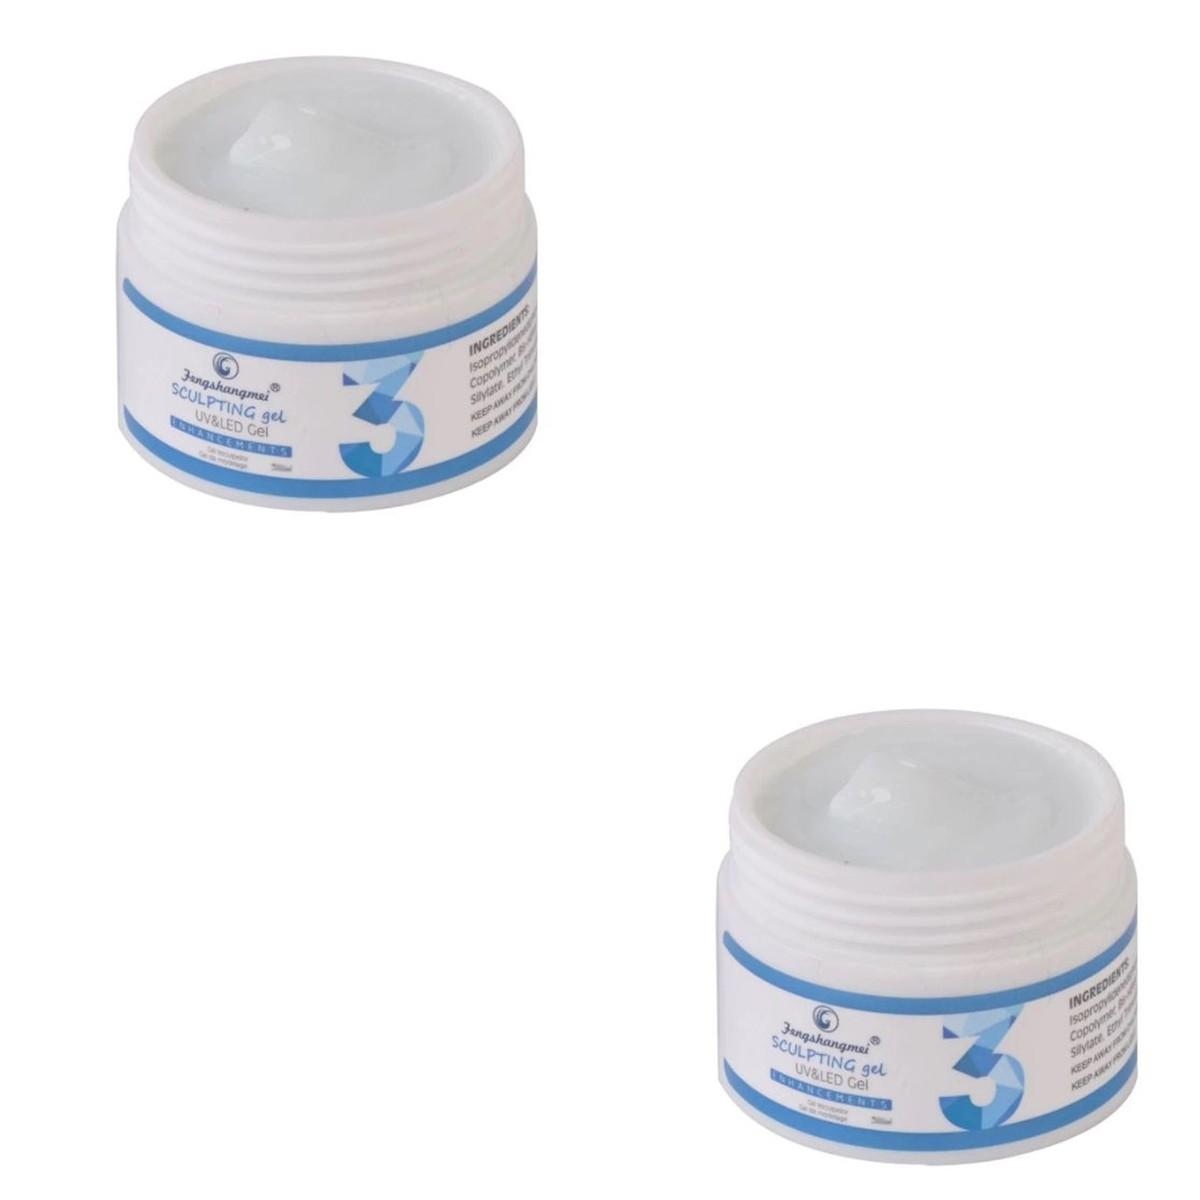 kit 2 Gel Sculpting Uv led Fengshangmei Unhas Porcelana 15ml 03 Natural